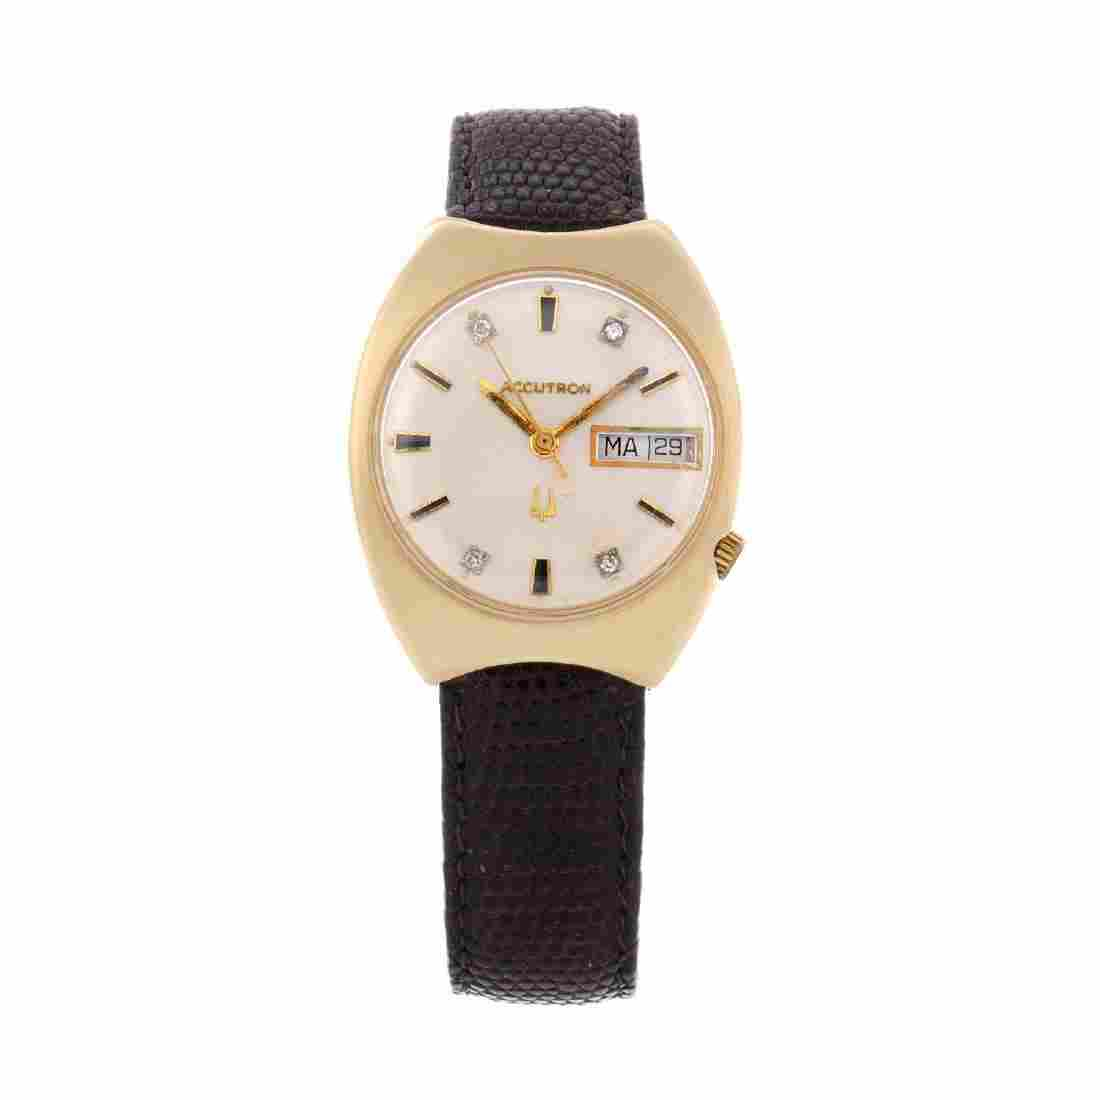 BULOVA - a gentleman's Accutron wrist watch. Yellow